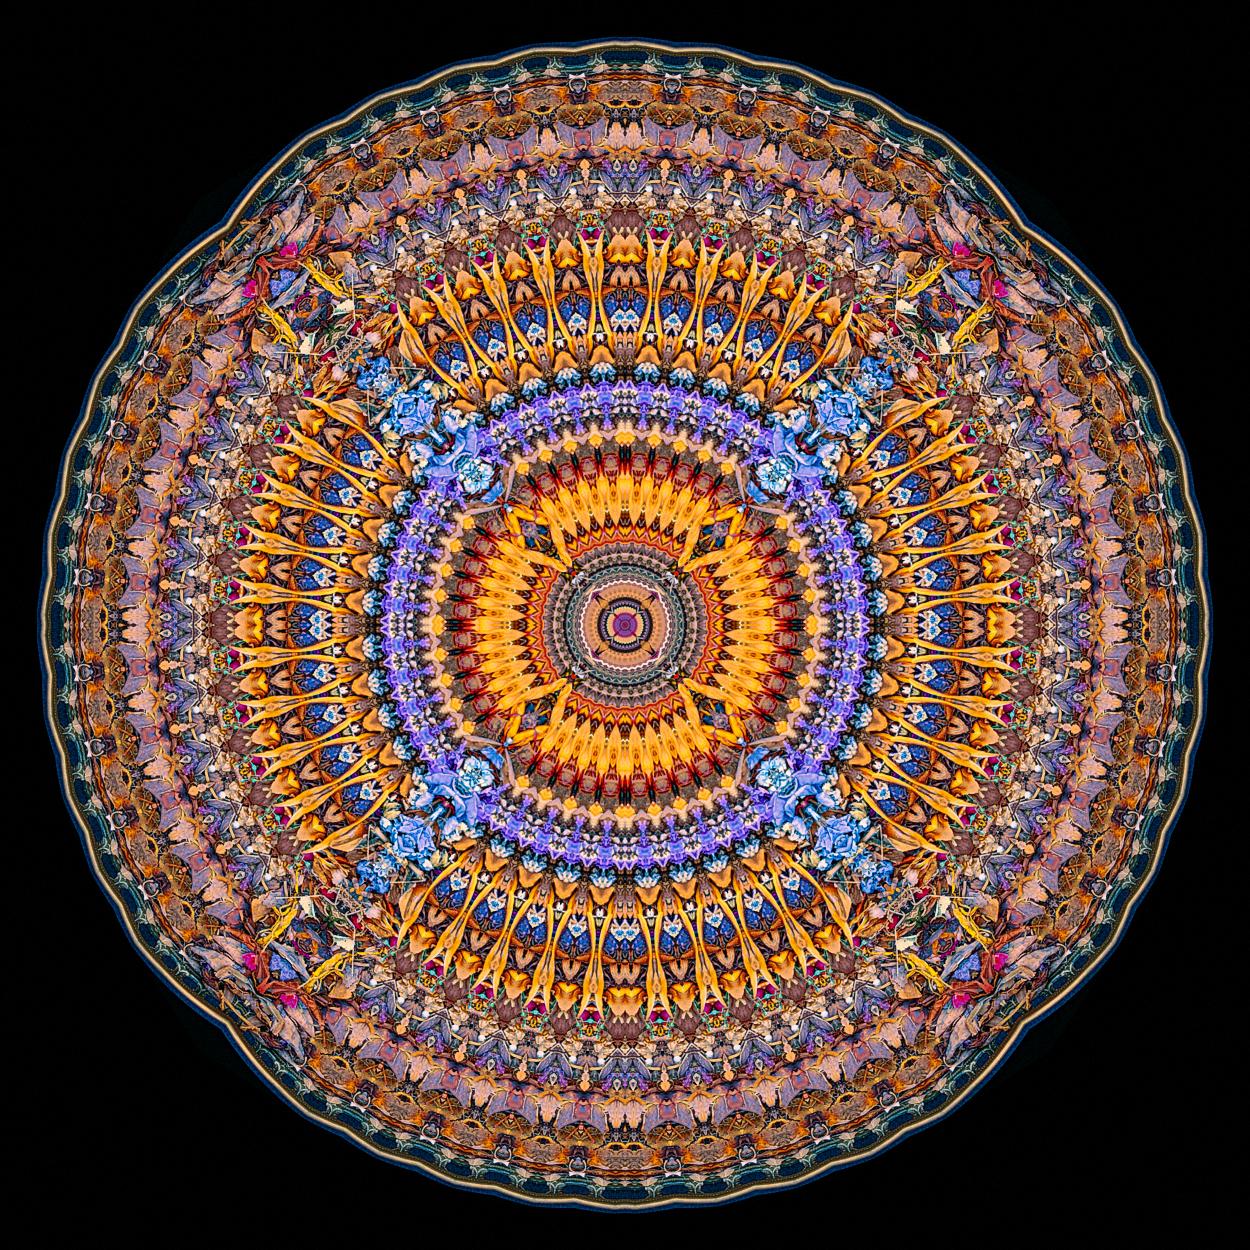 Cg Jung Mandalas Squareone Explorations